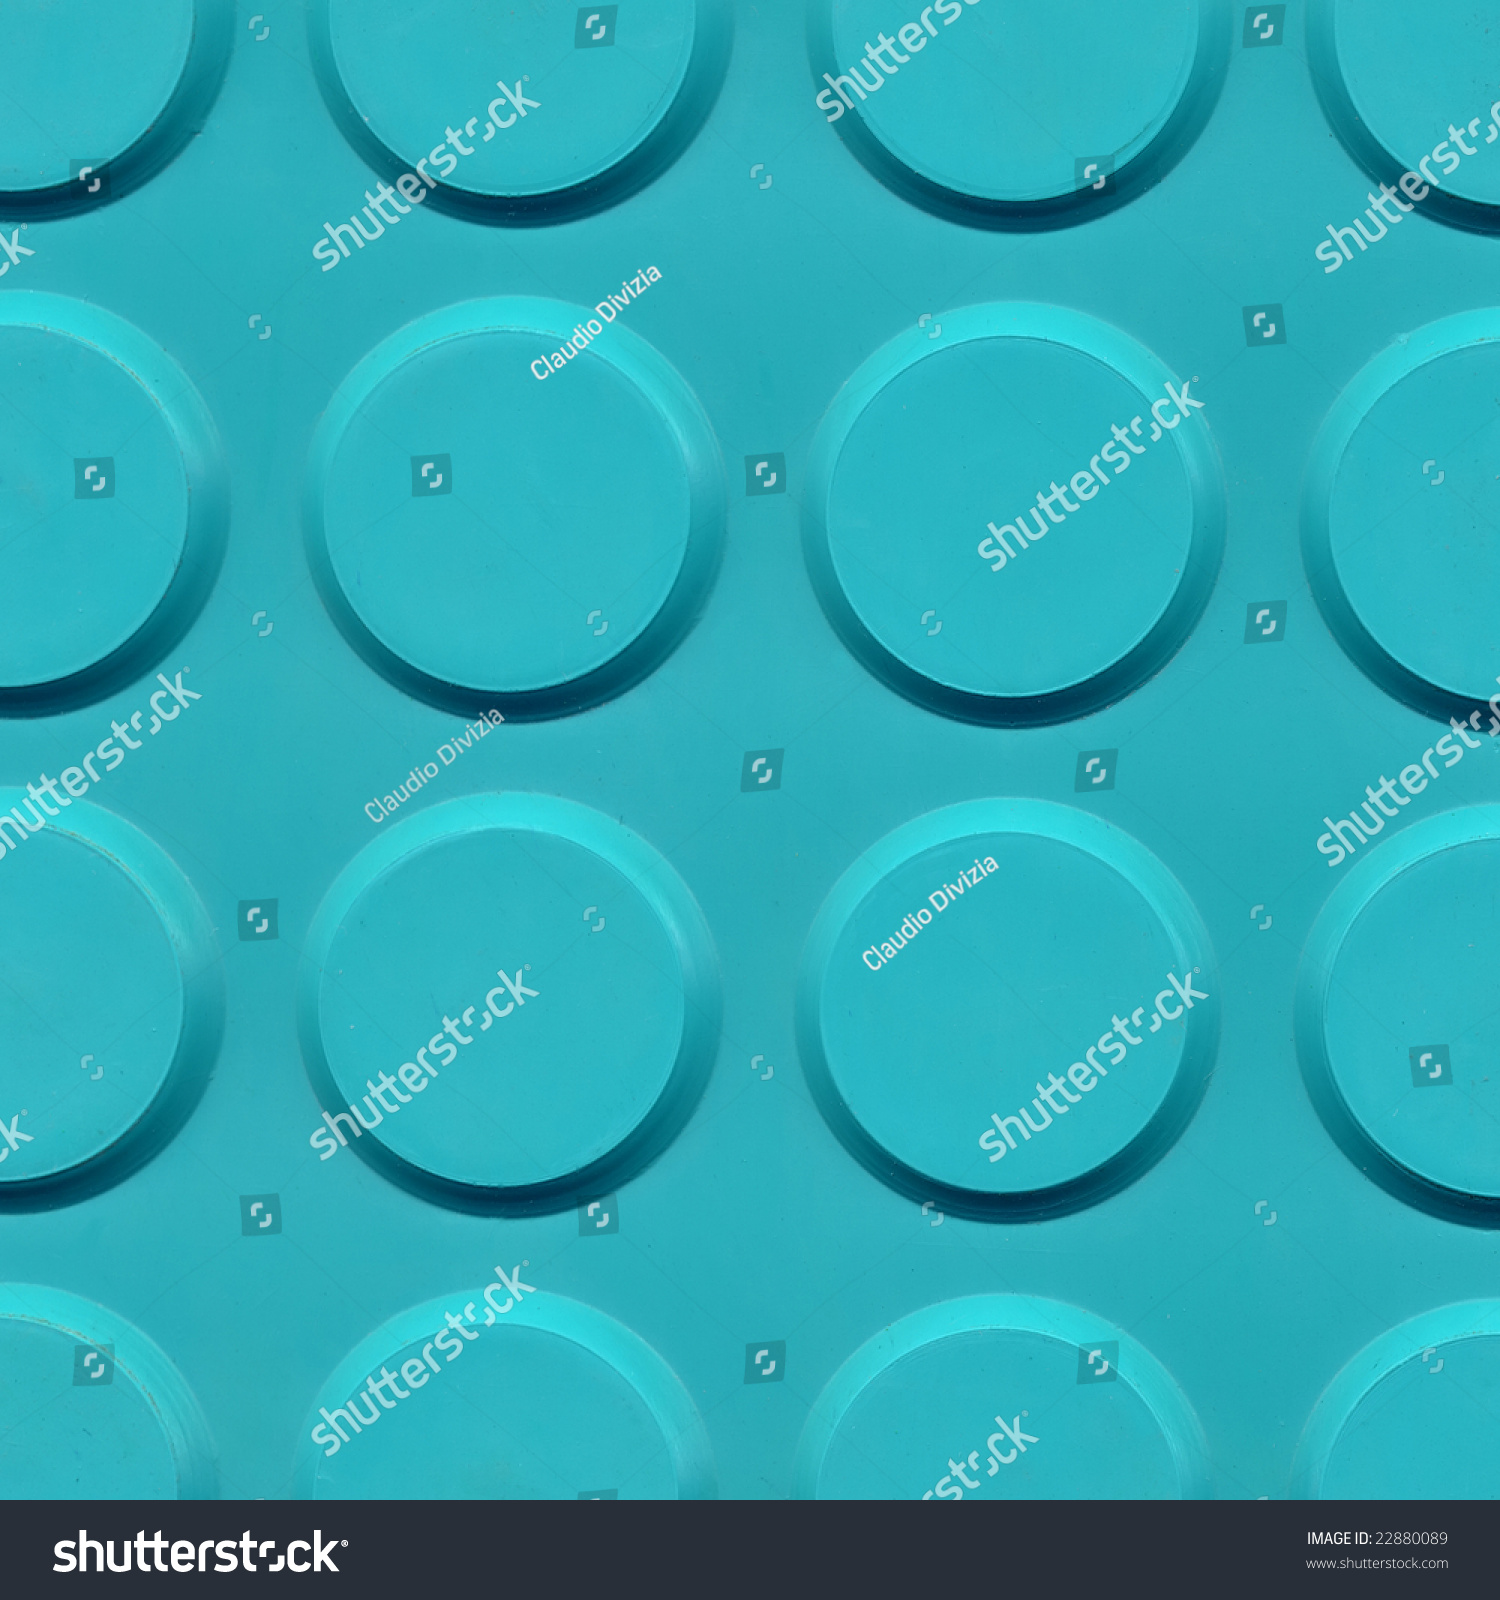 Rubber linoleum floor tiles background stock photo 22880089 rubber or linoleum floor tiles background dailygadgetfo Image collections